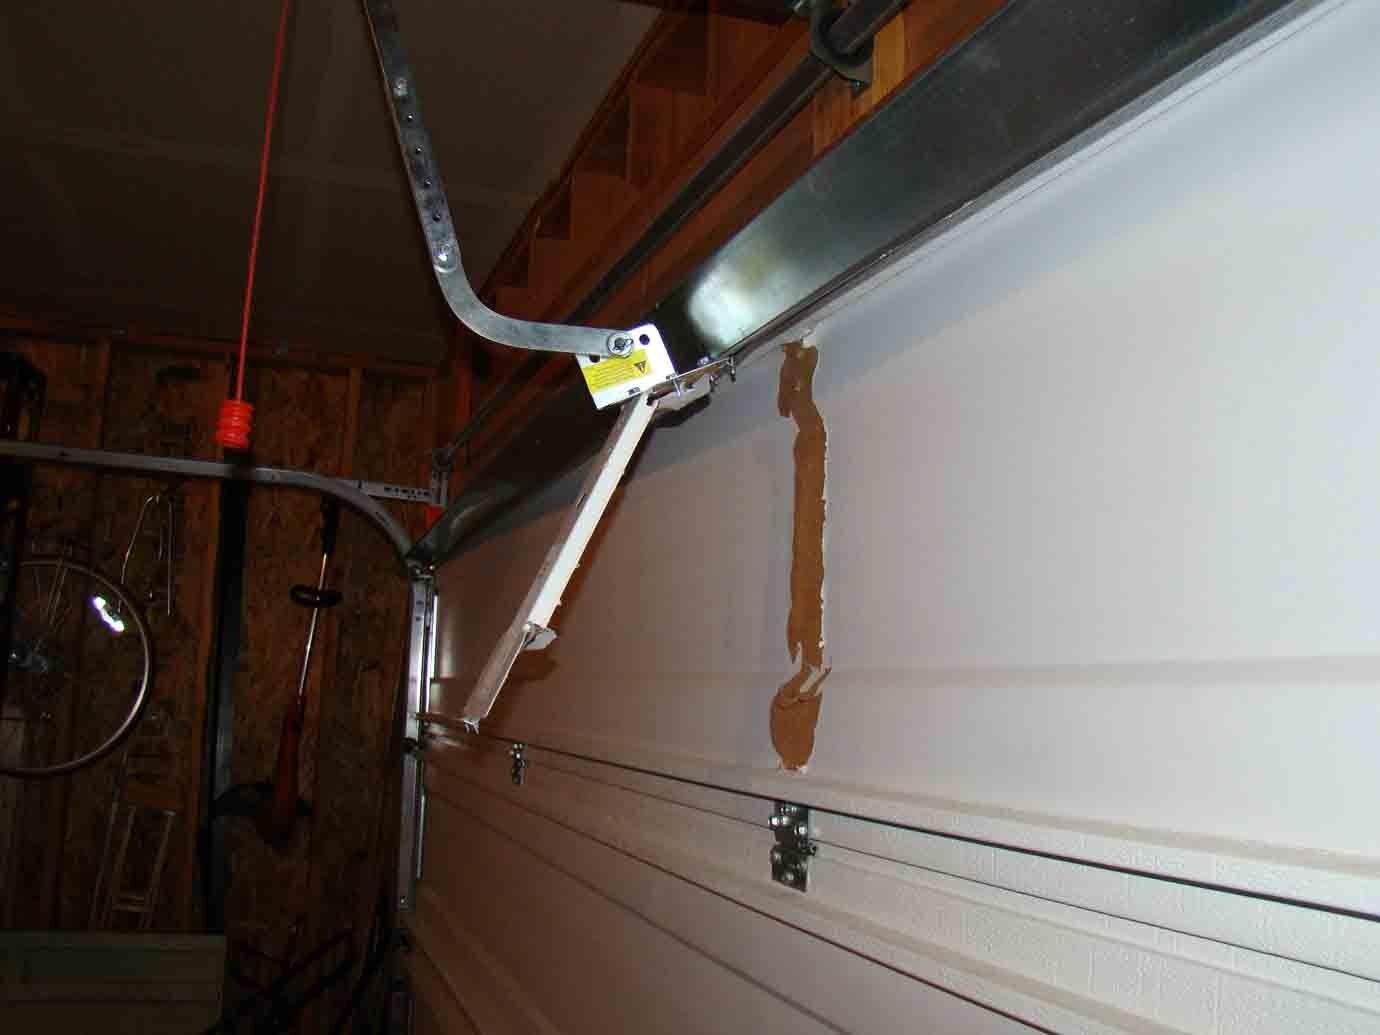 Garage Door Mounting Bracket Broken With Regard To Aspiration Http